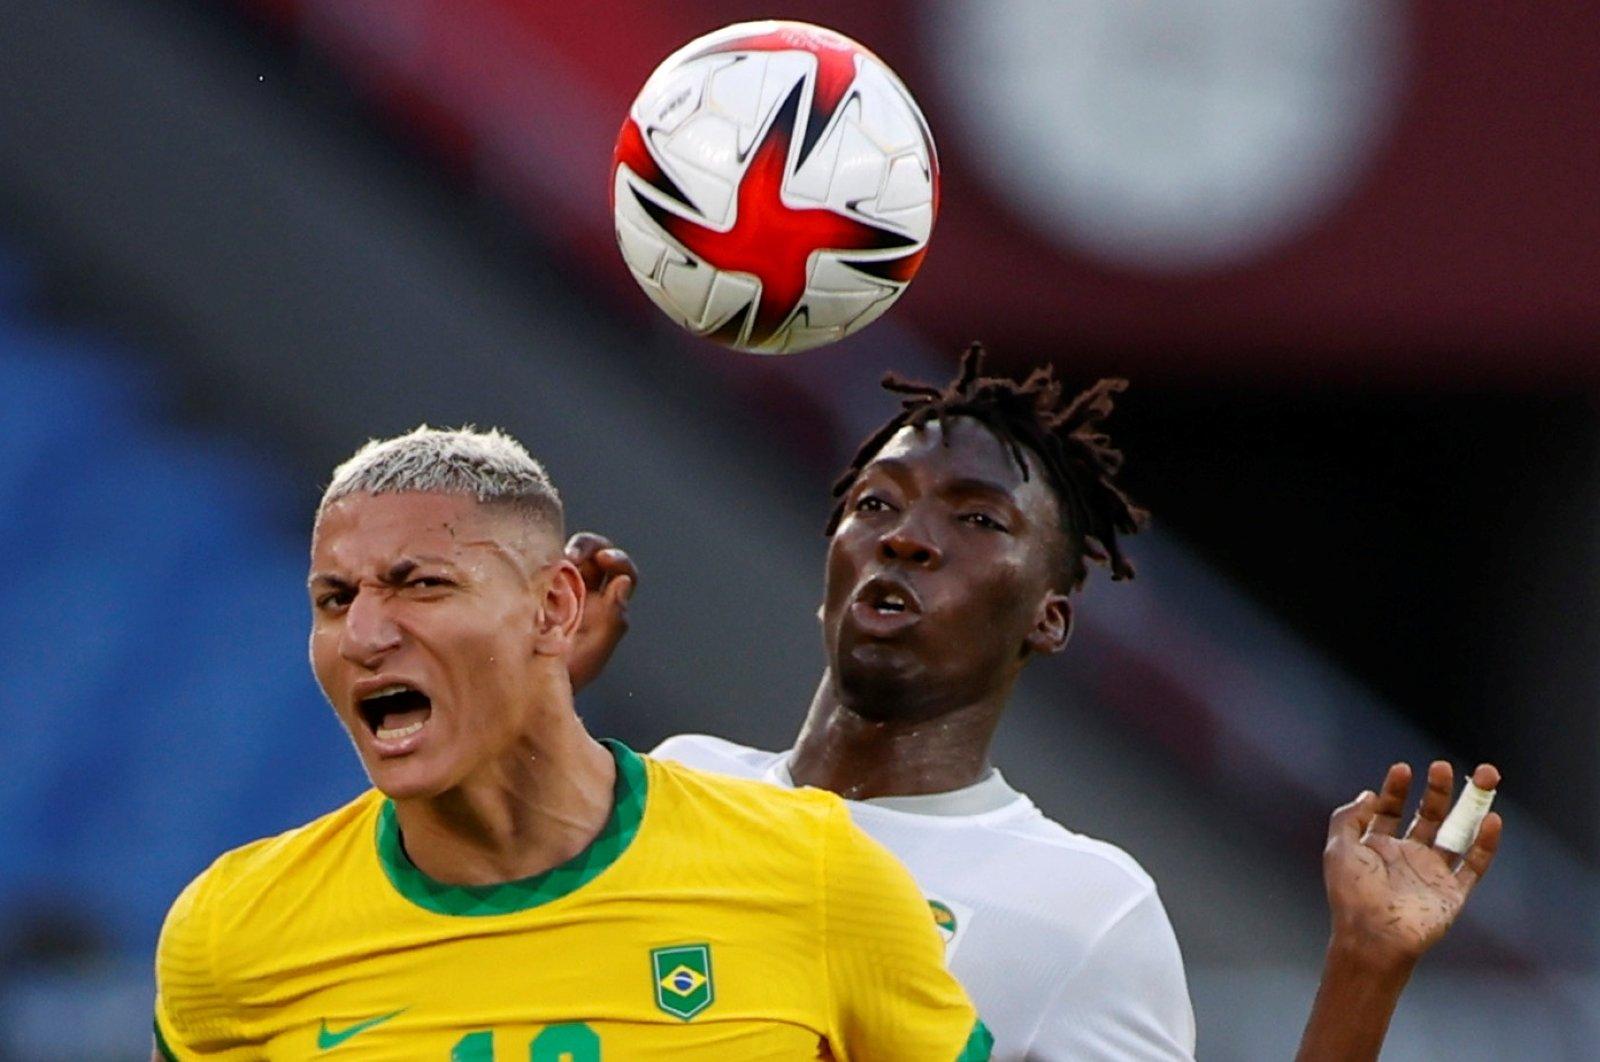 Brazil's Richarlison in action against Ivory Coast's Zie Ouattara during Tokyo 2020 Olympics Group D football match at International Stadium Yokohama, Yokohama, Japan, July 25, 2021.